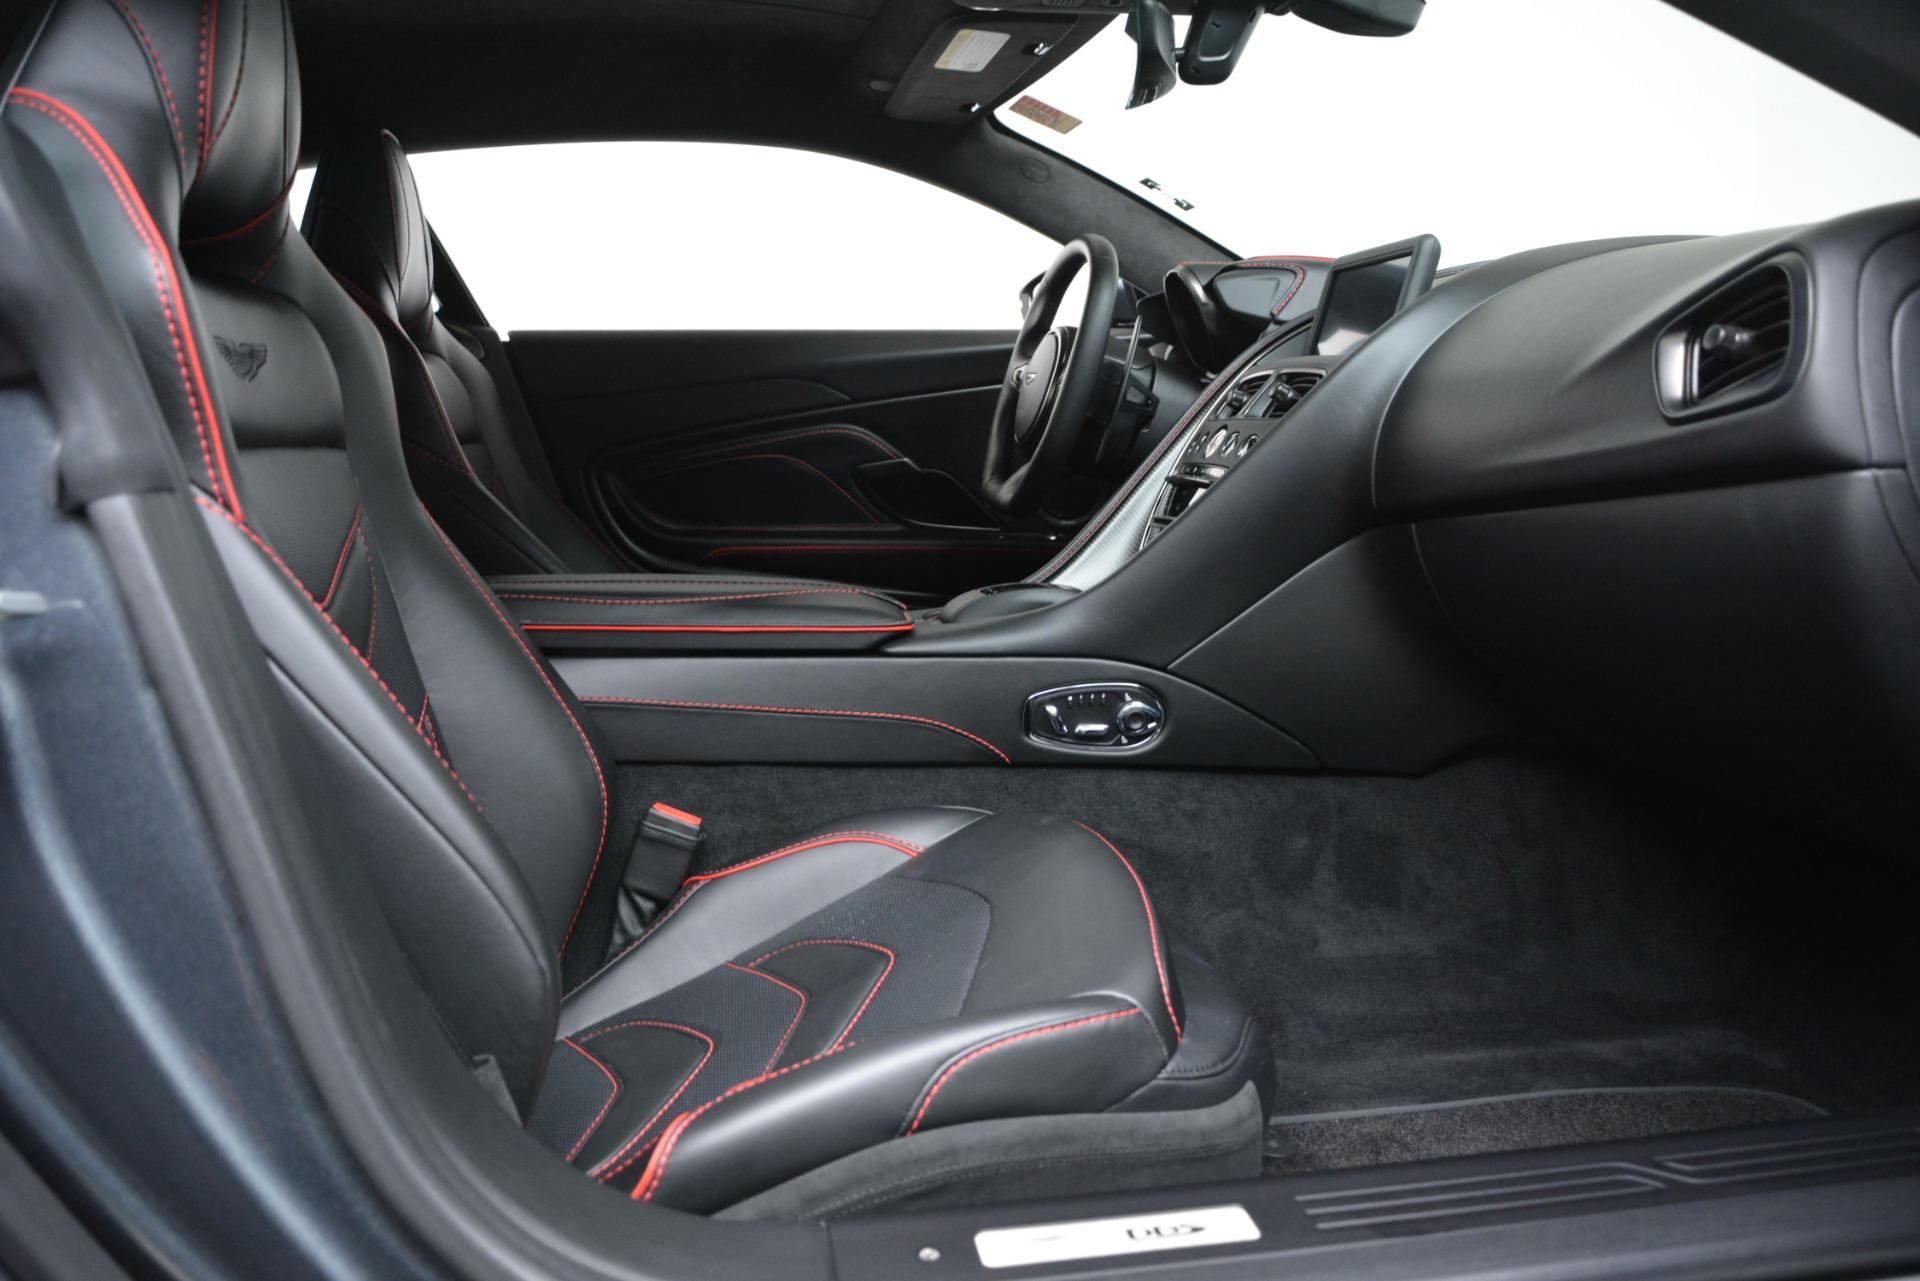 New 2019 Aston Martin DBS Superleggera Coupe For Sale In Greenwich, CT 3318_p15